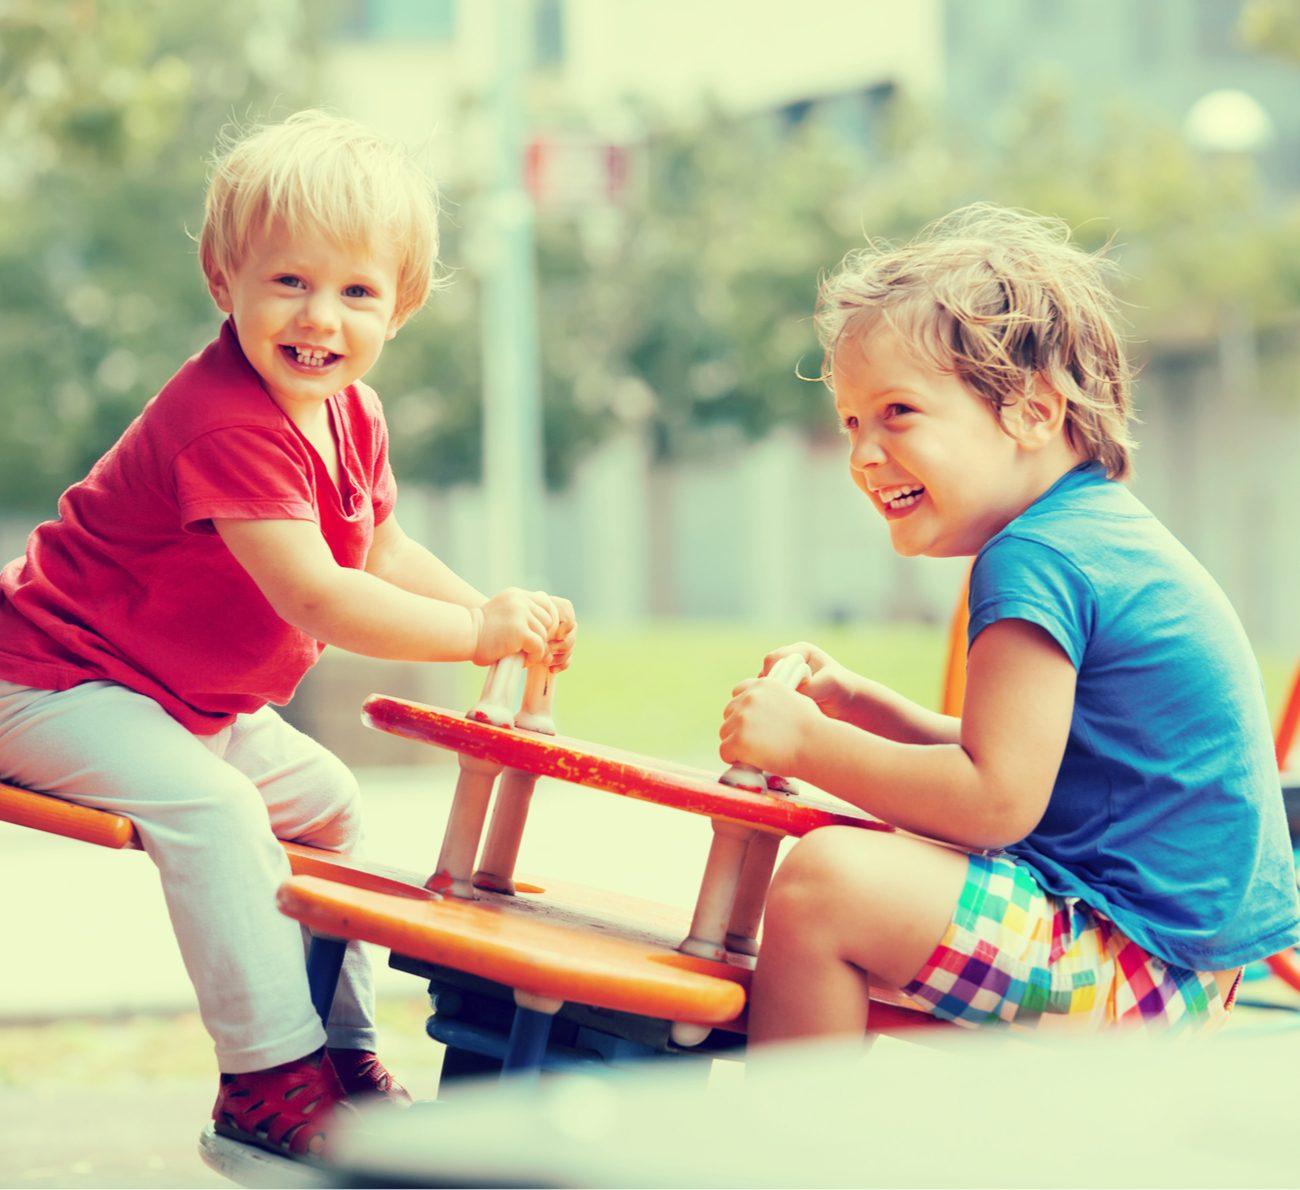 brincadeiras na infância